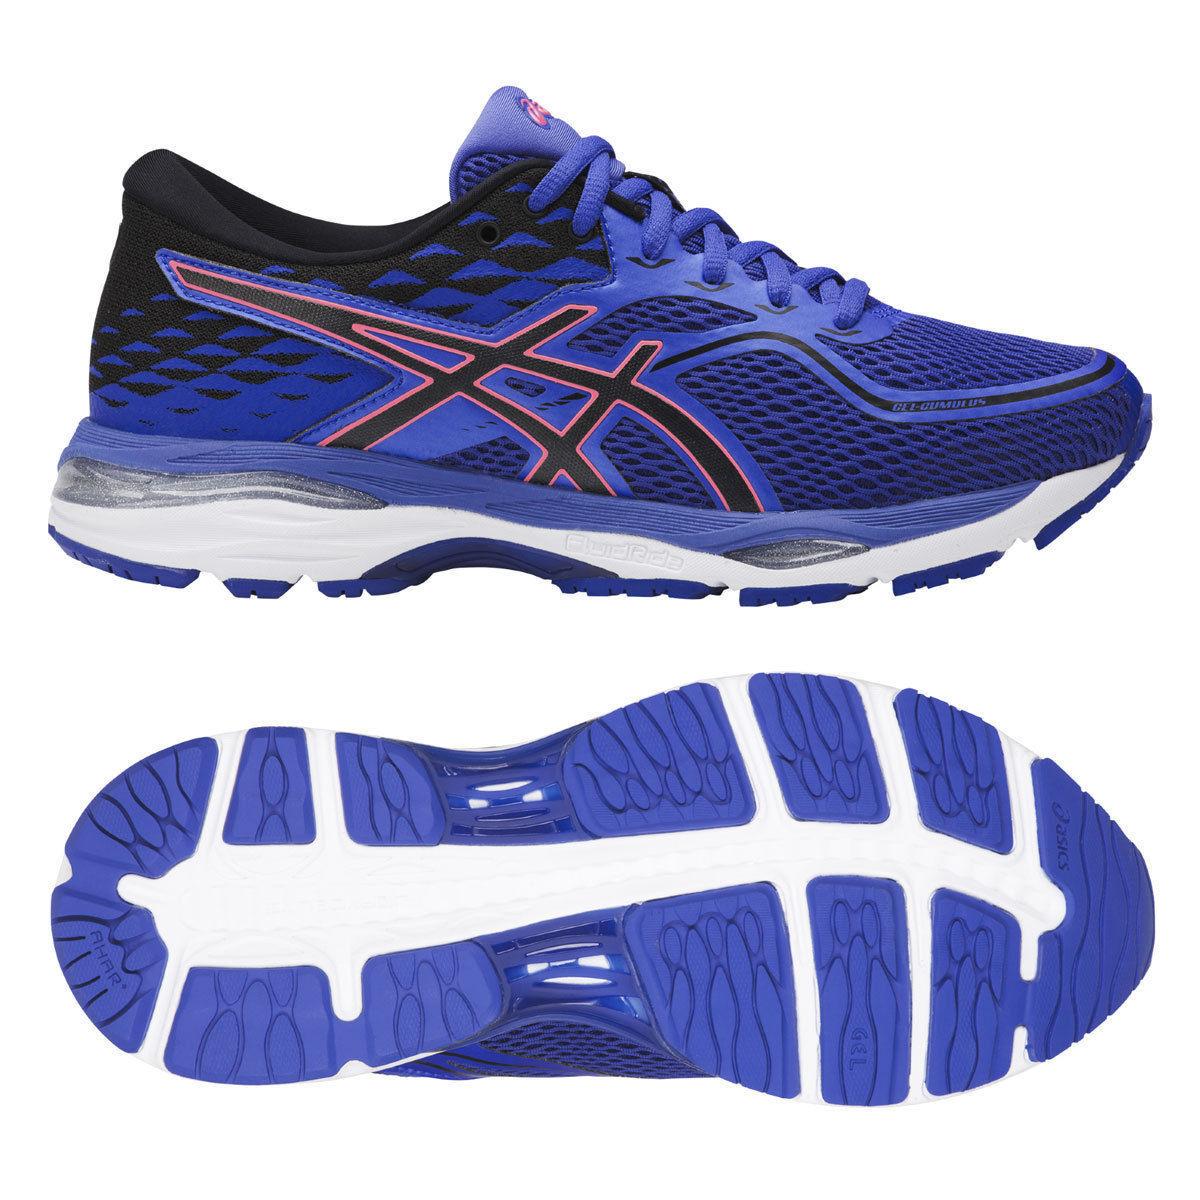 ASSICS GEL CUMULUS 19 Damen Laufschuhe Schuhe Running Schuhe Laufschuhe Joggingschuhe T7B8N-4890 c6ff23